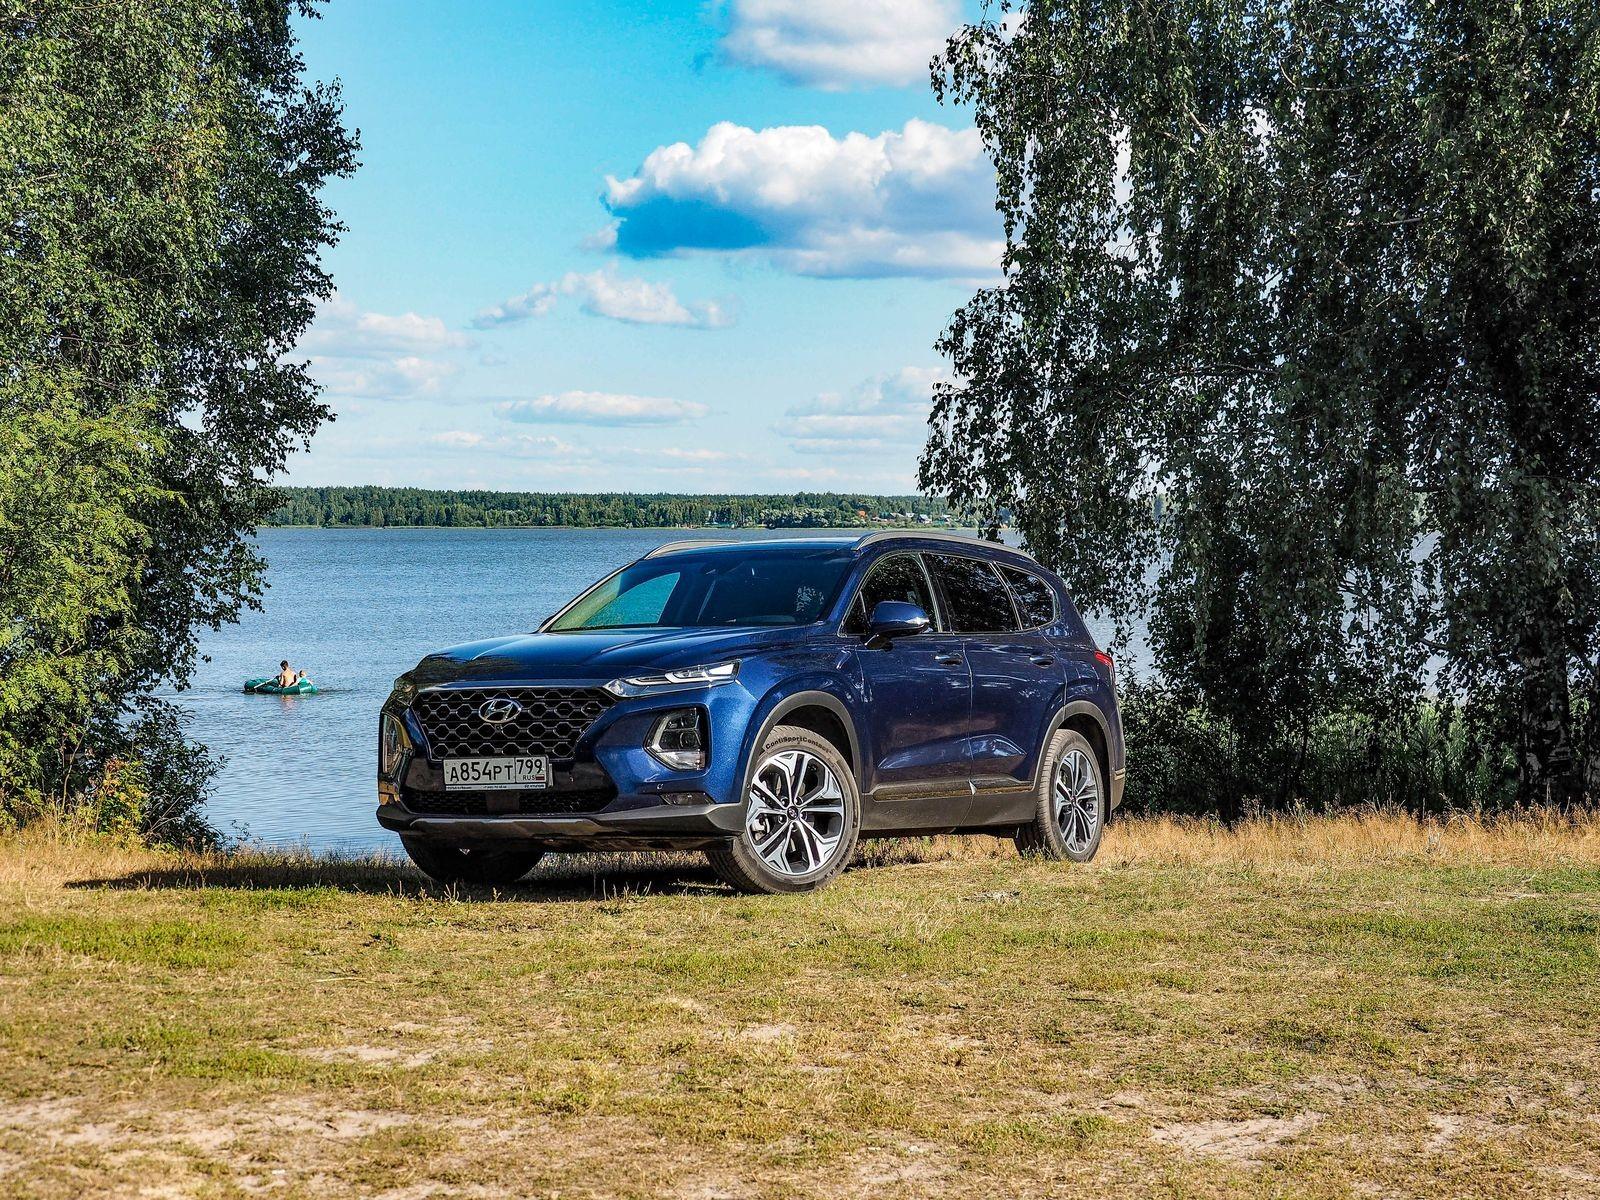 По дороге мануфактур и ремесел: путешествие на Hyundai Santa Fe